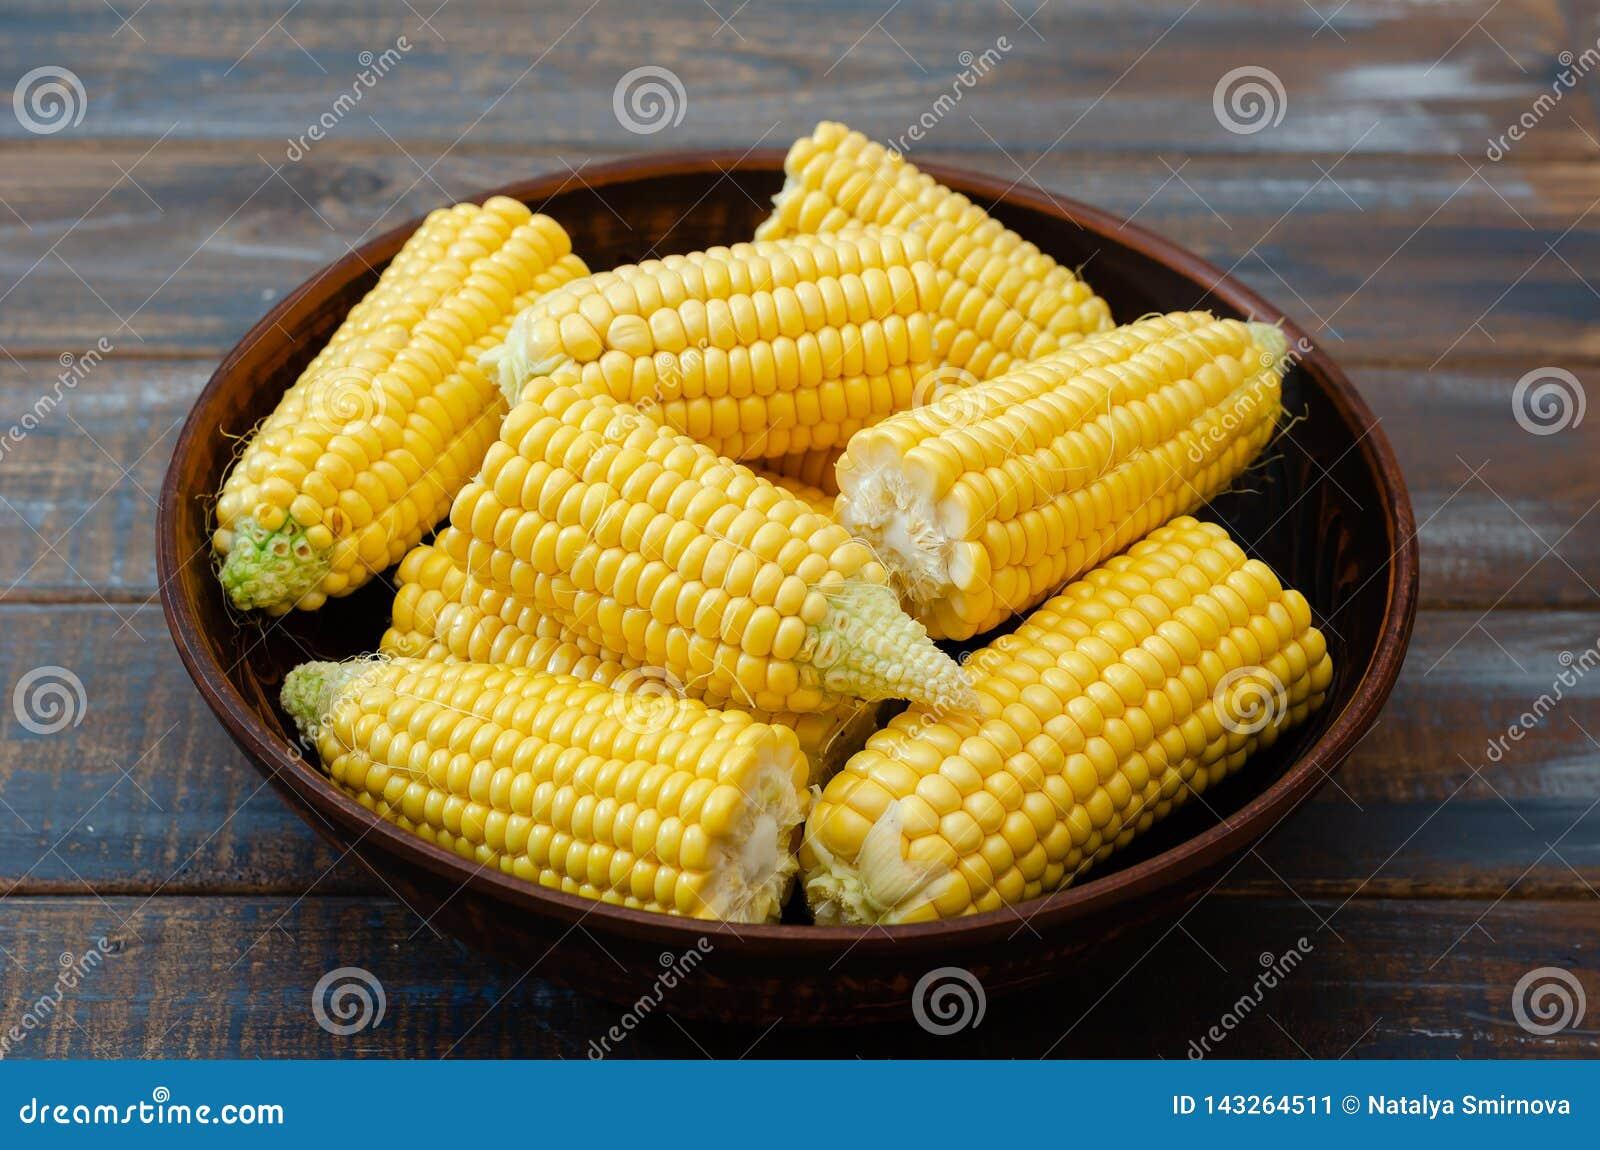 Ripe corn in a clay bowl.